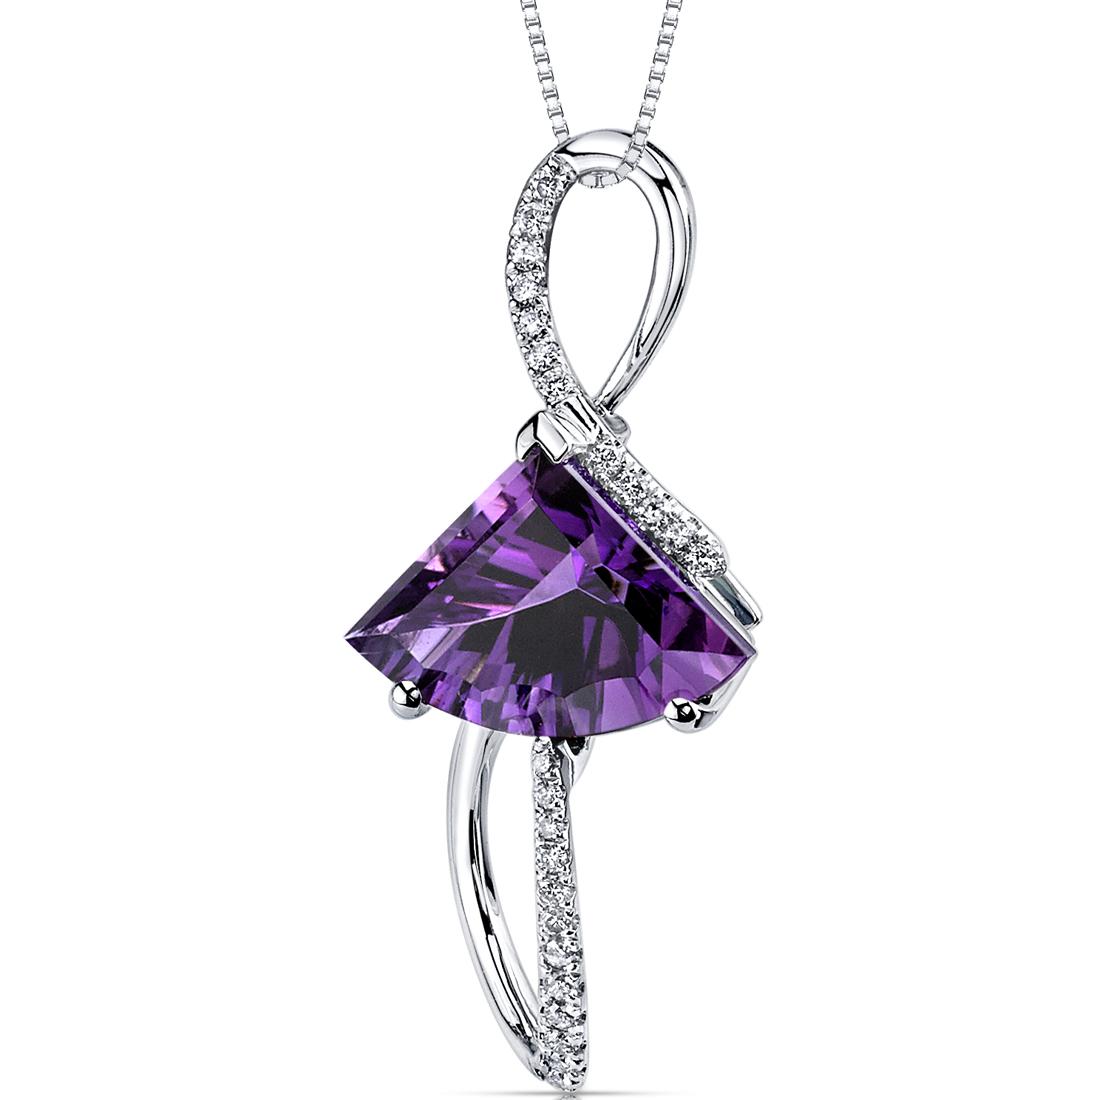 peora Amethyst Diamond Pendant 14Kt White Gold 3.5 Cts P9296 at Sears.com